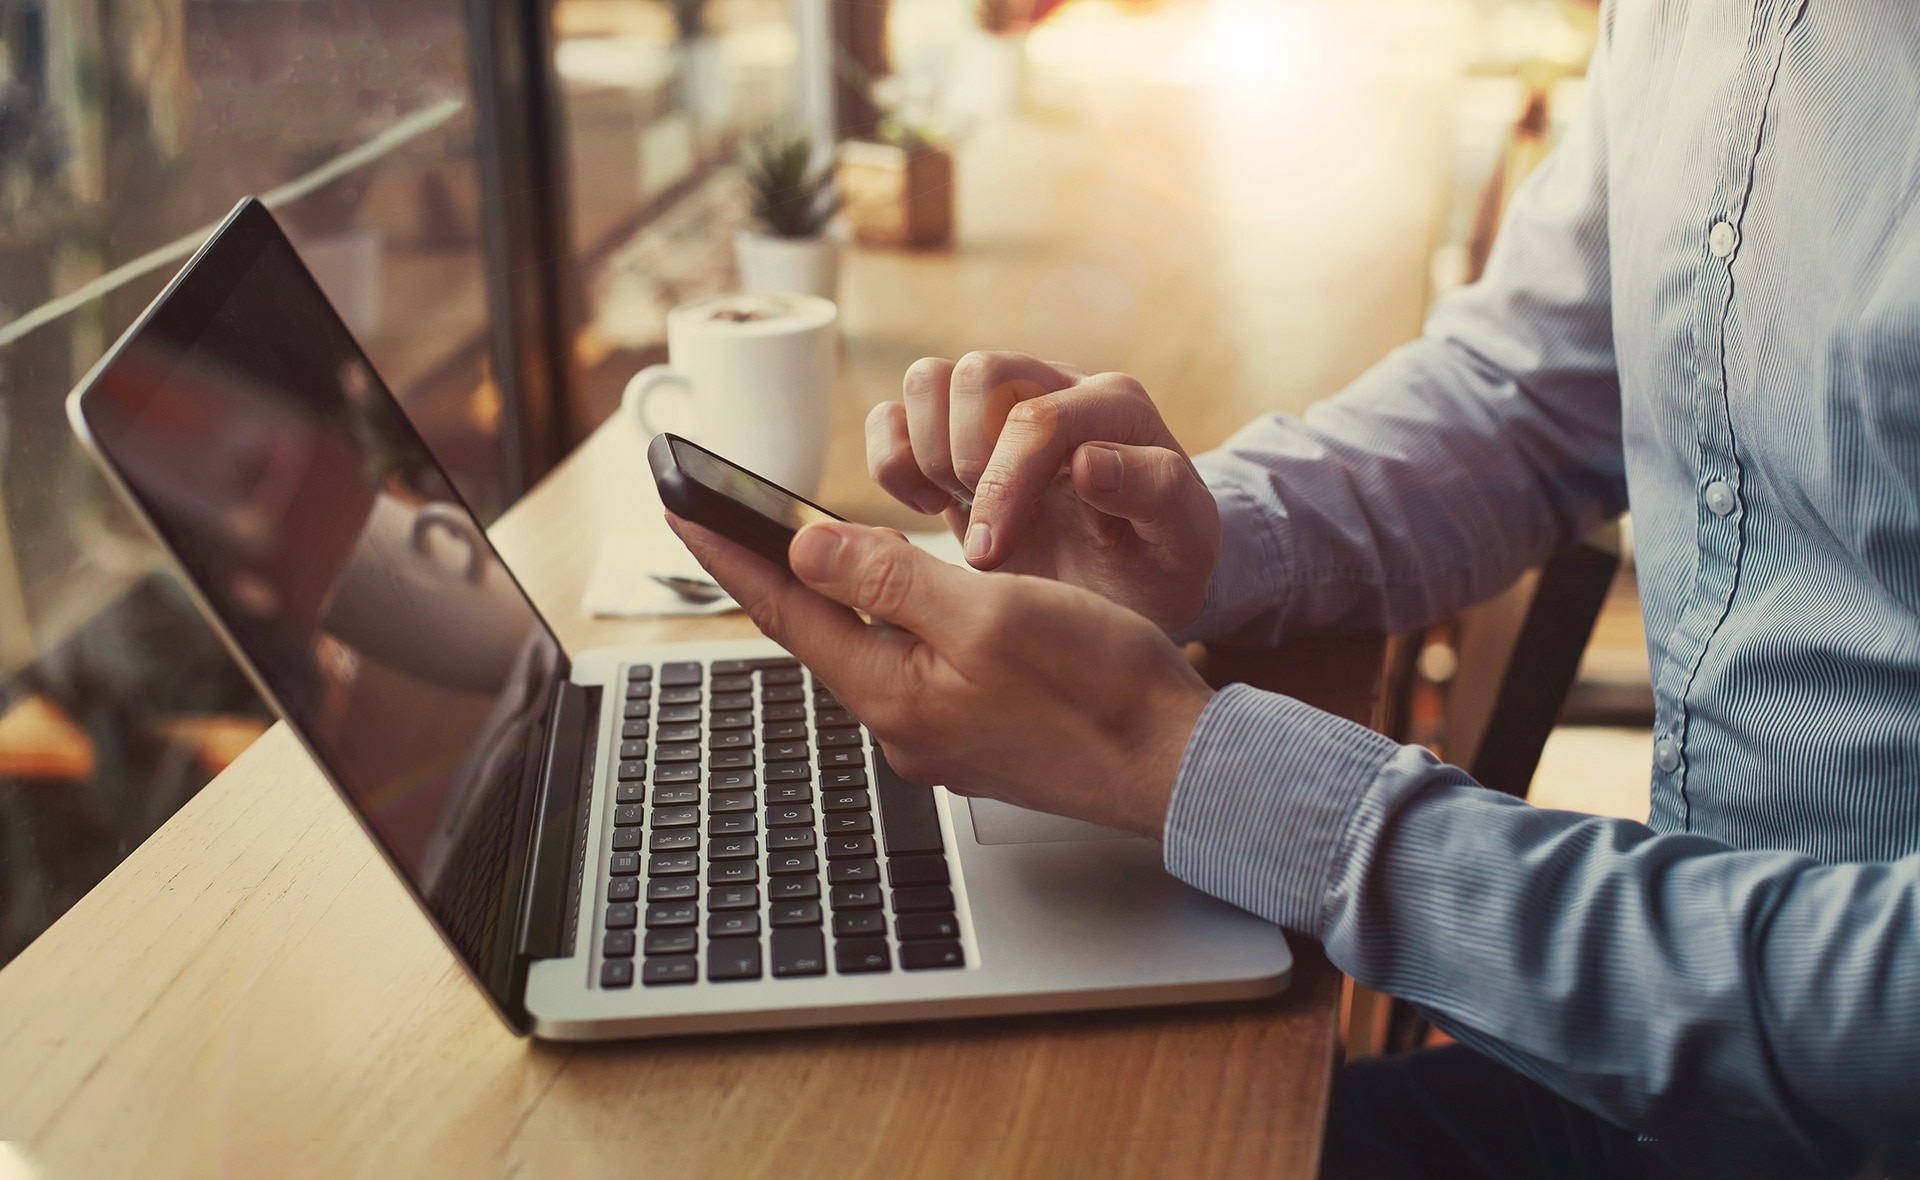 clientes_digitales-BBVA-canales-dispositivos-portatil-movil-smartphone-trabajo-